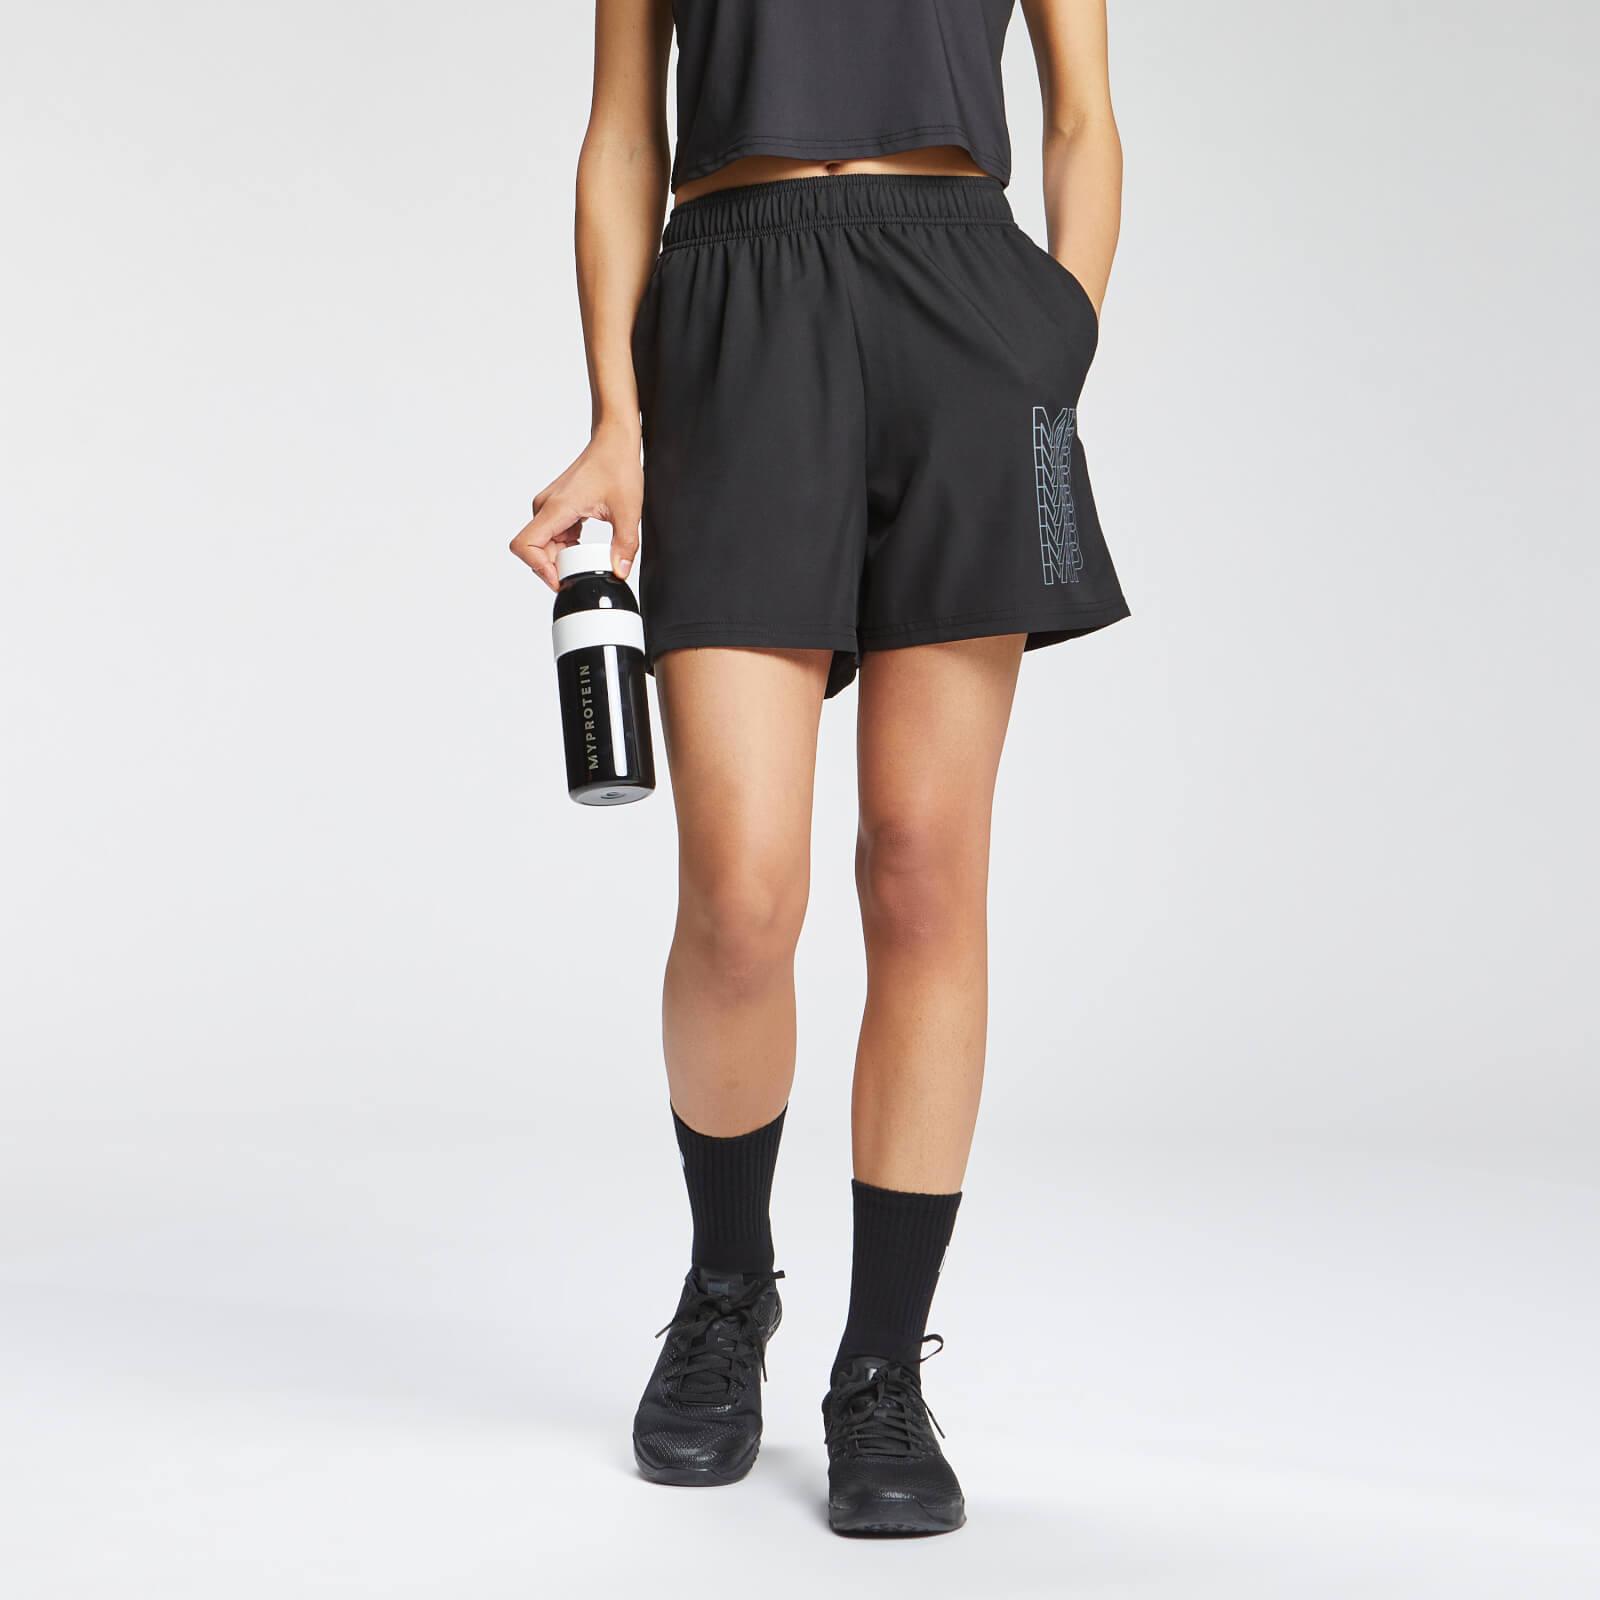 MP Women's Repeat MP Training Shorts - Black - S, Myprotein International  - купить со скидкой